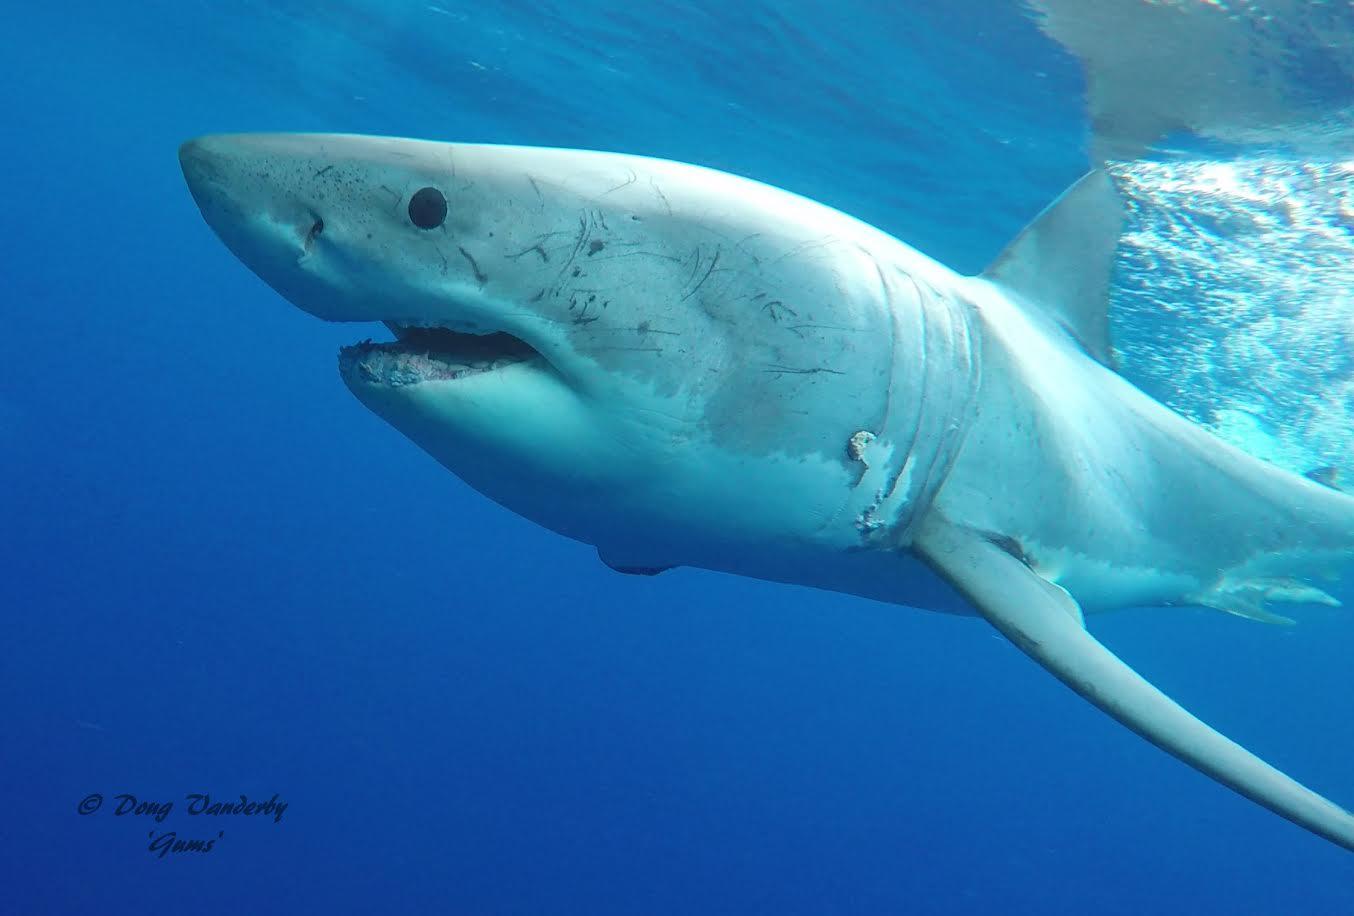 Gums the Toothless Shark